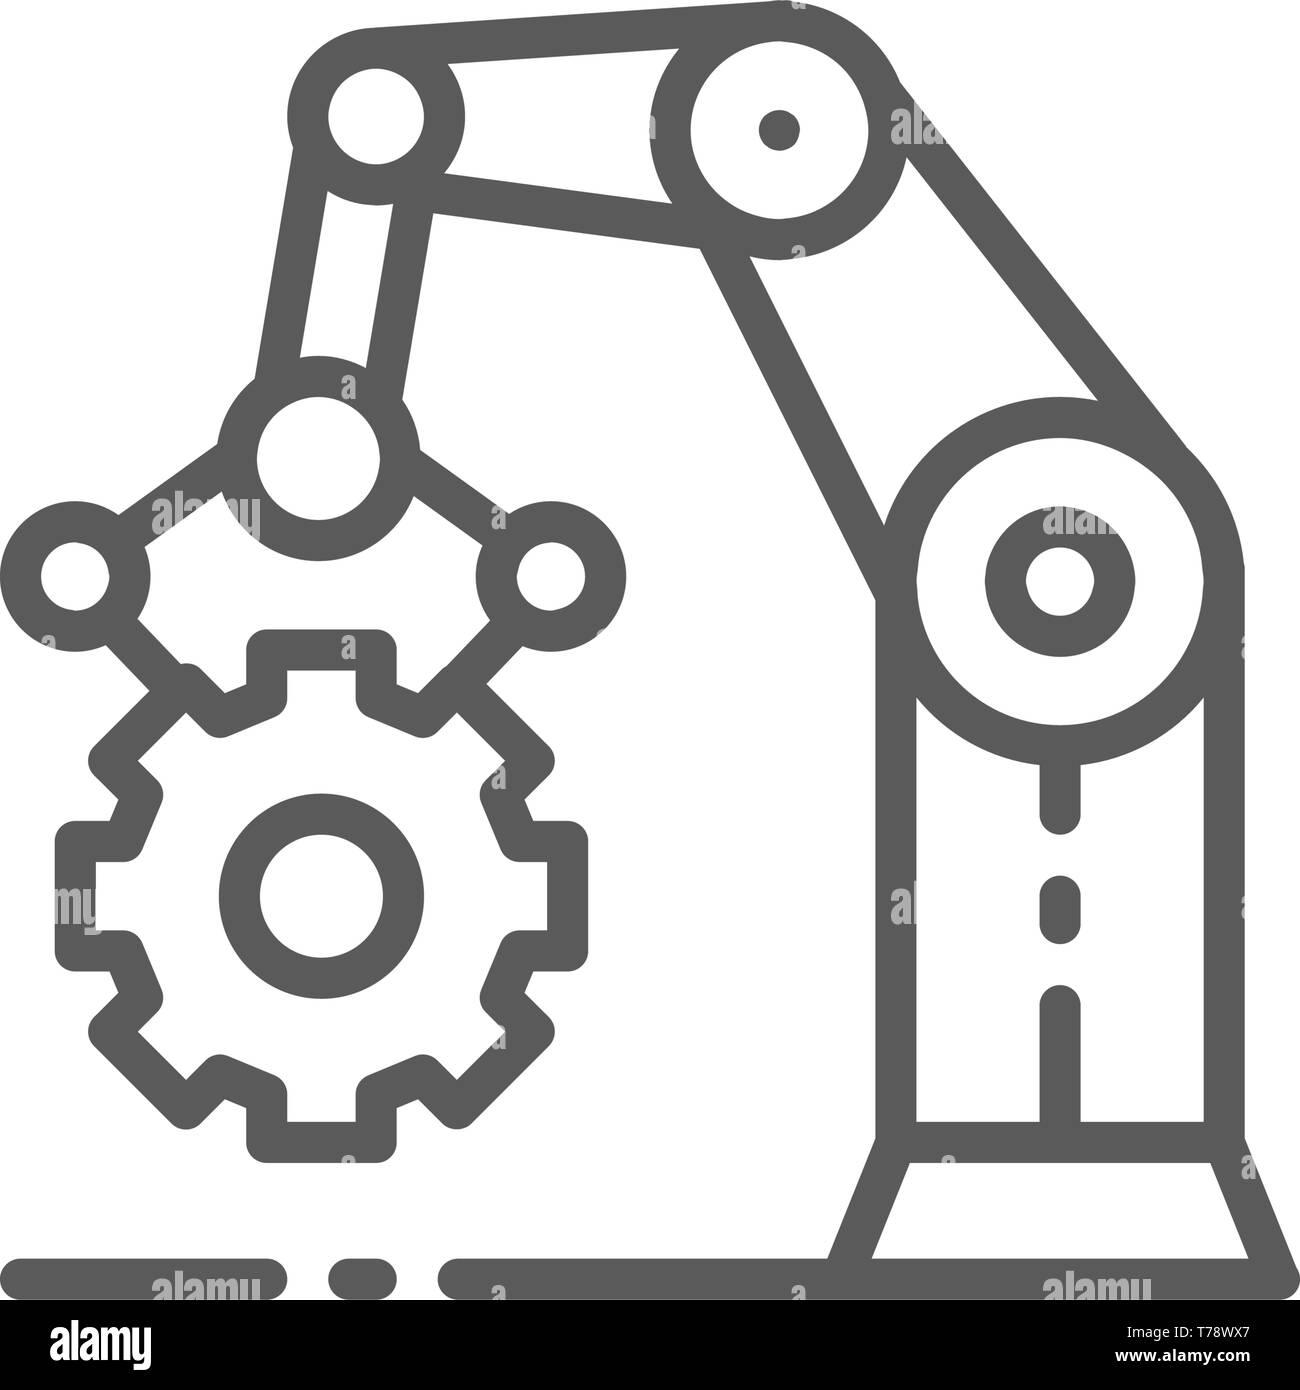 Robotic manipulator arm with cogwheel, working mechanism, production line icon. - Stock Image